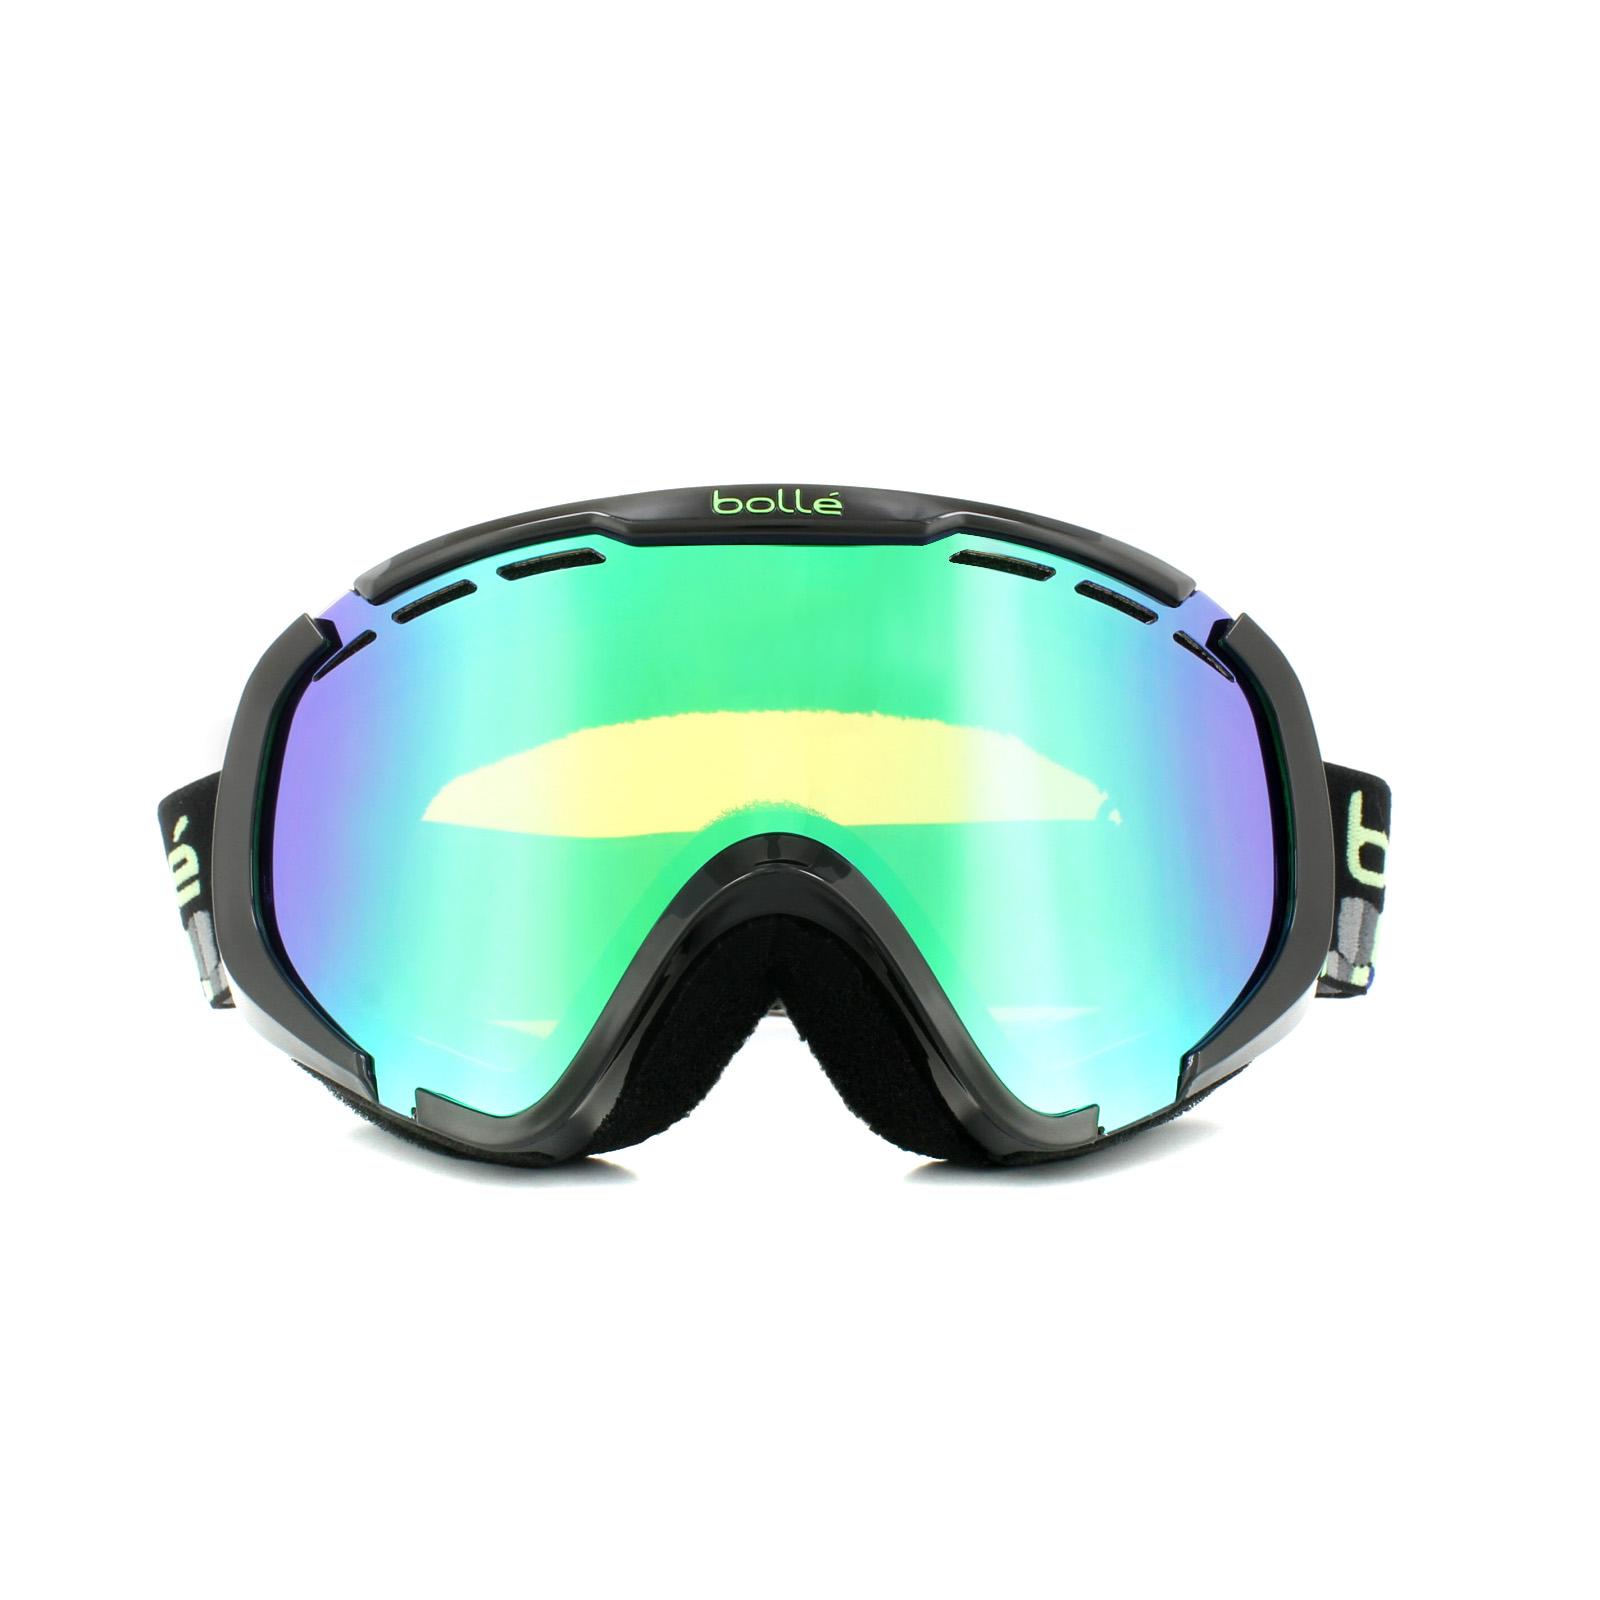 Cheap Bolle Explorer Junior Otg Ski Goggles Discounted